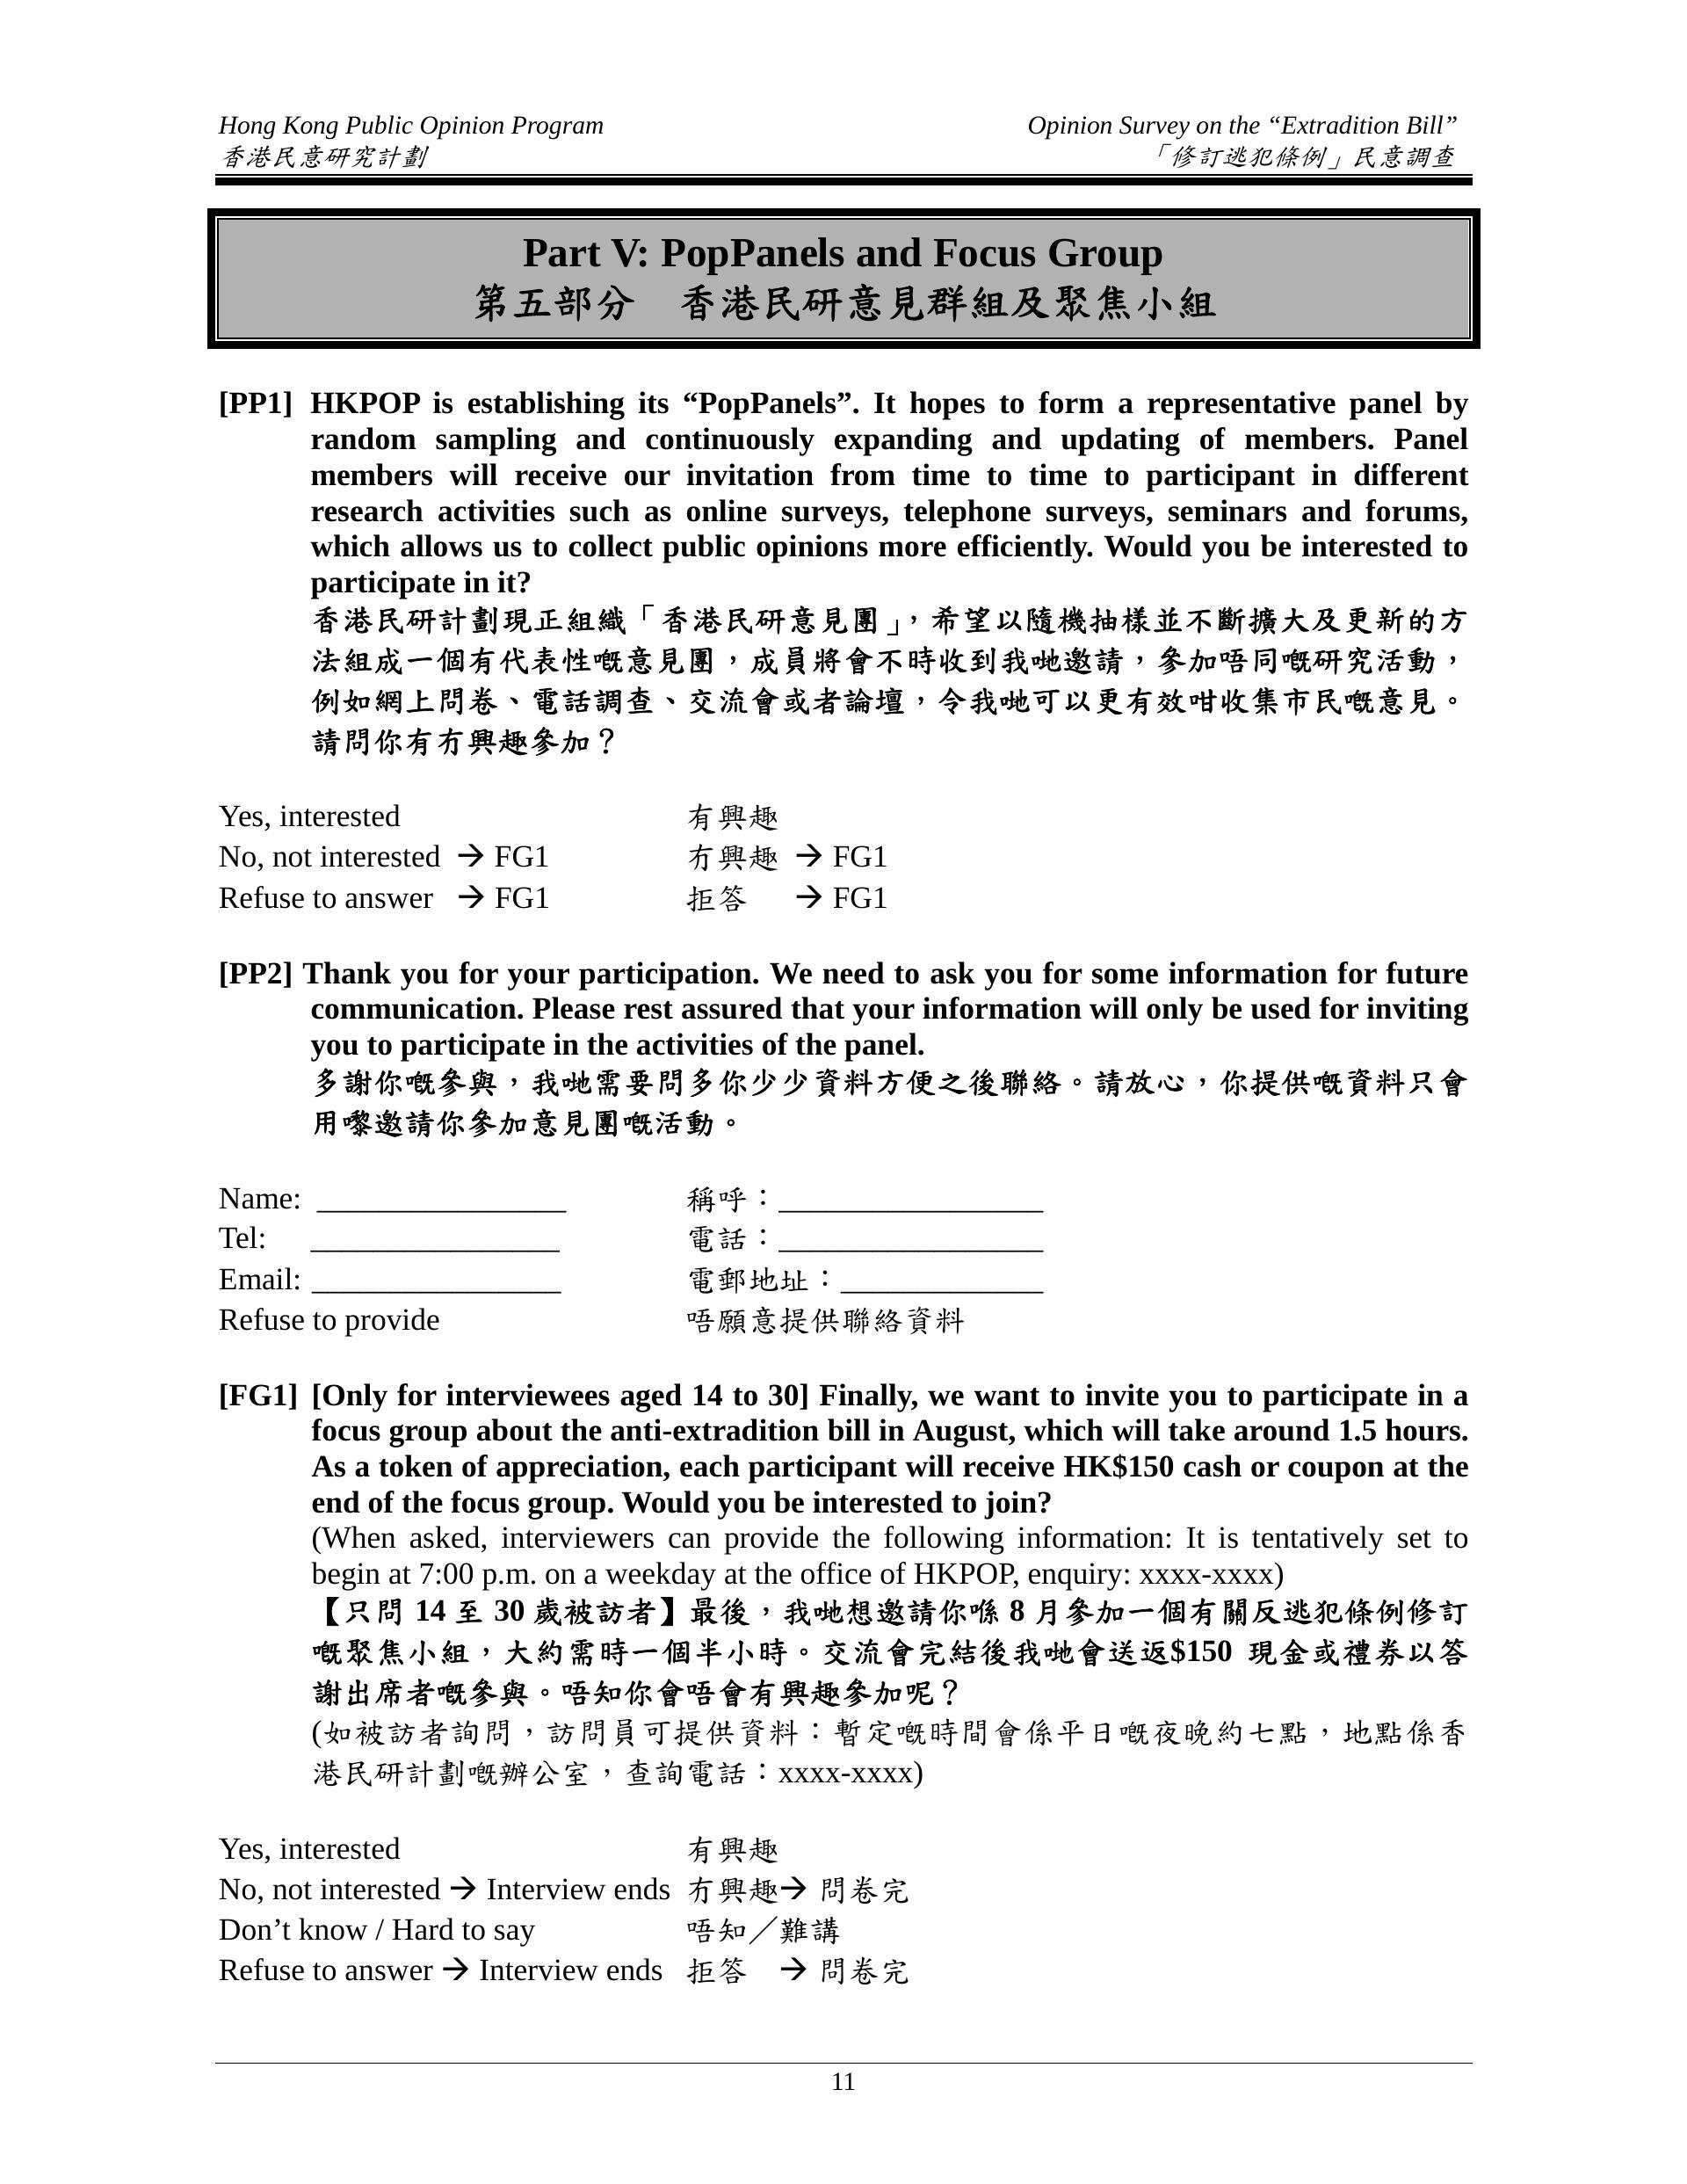 PDFtoJPG.me-11.jpg